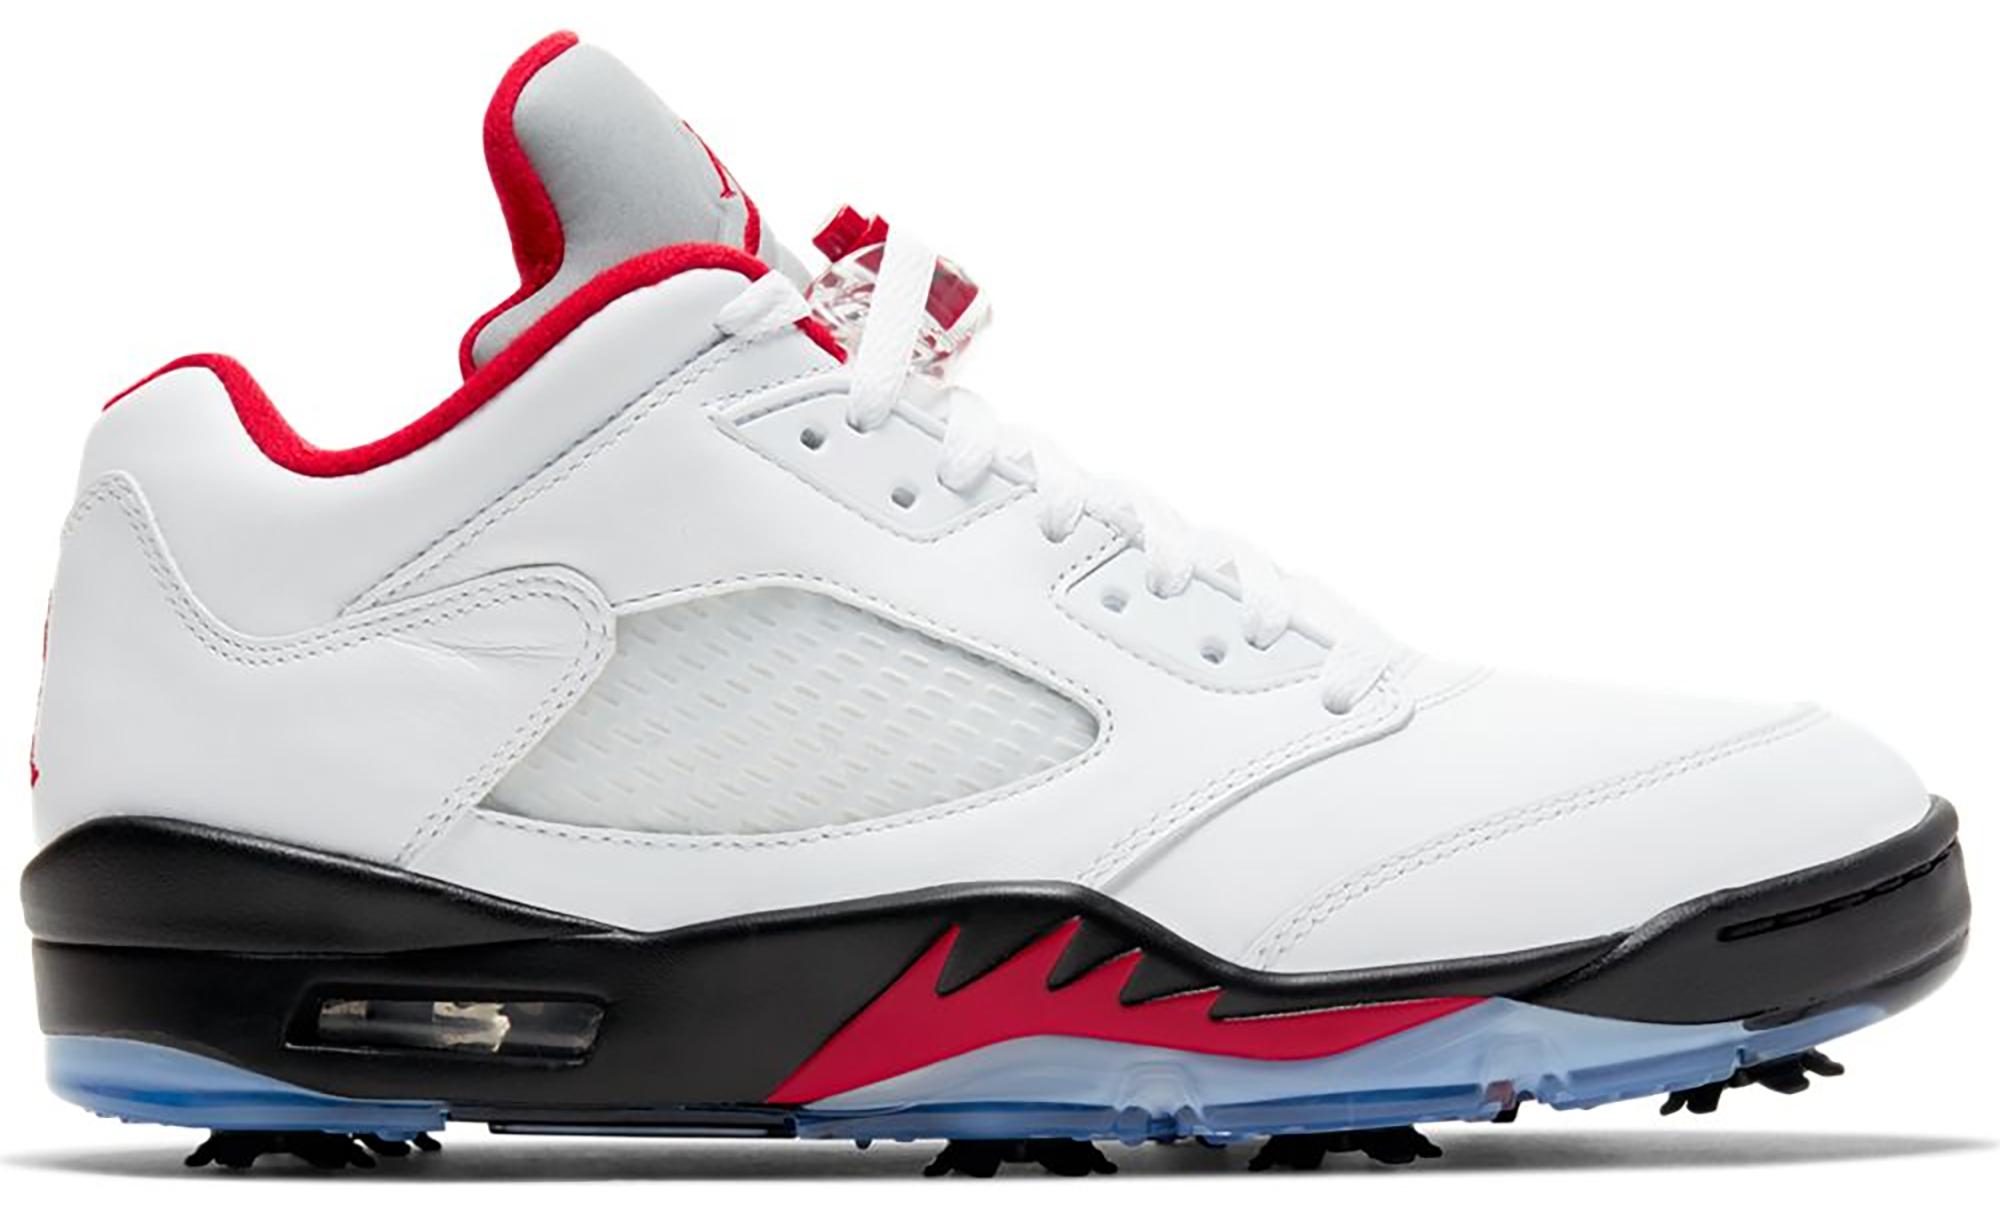 Jordan 5 Retro Low Golf Fire Red